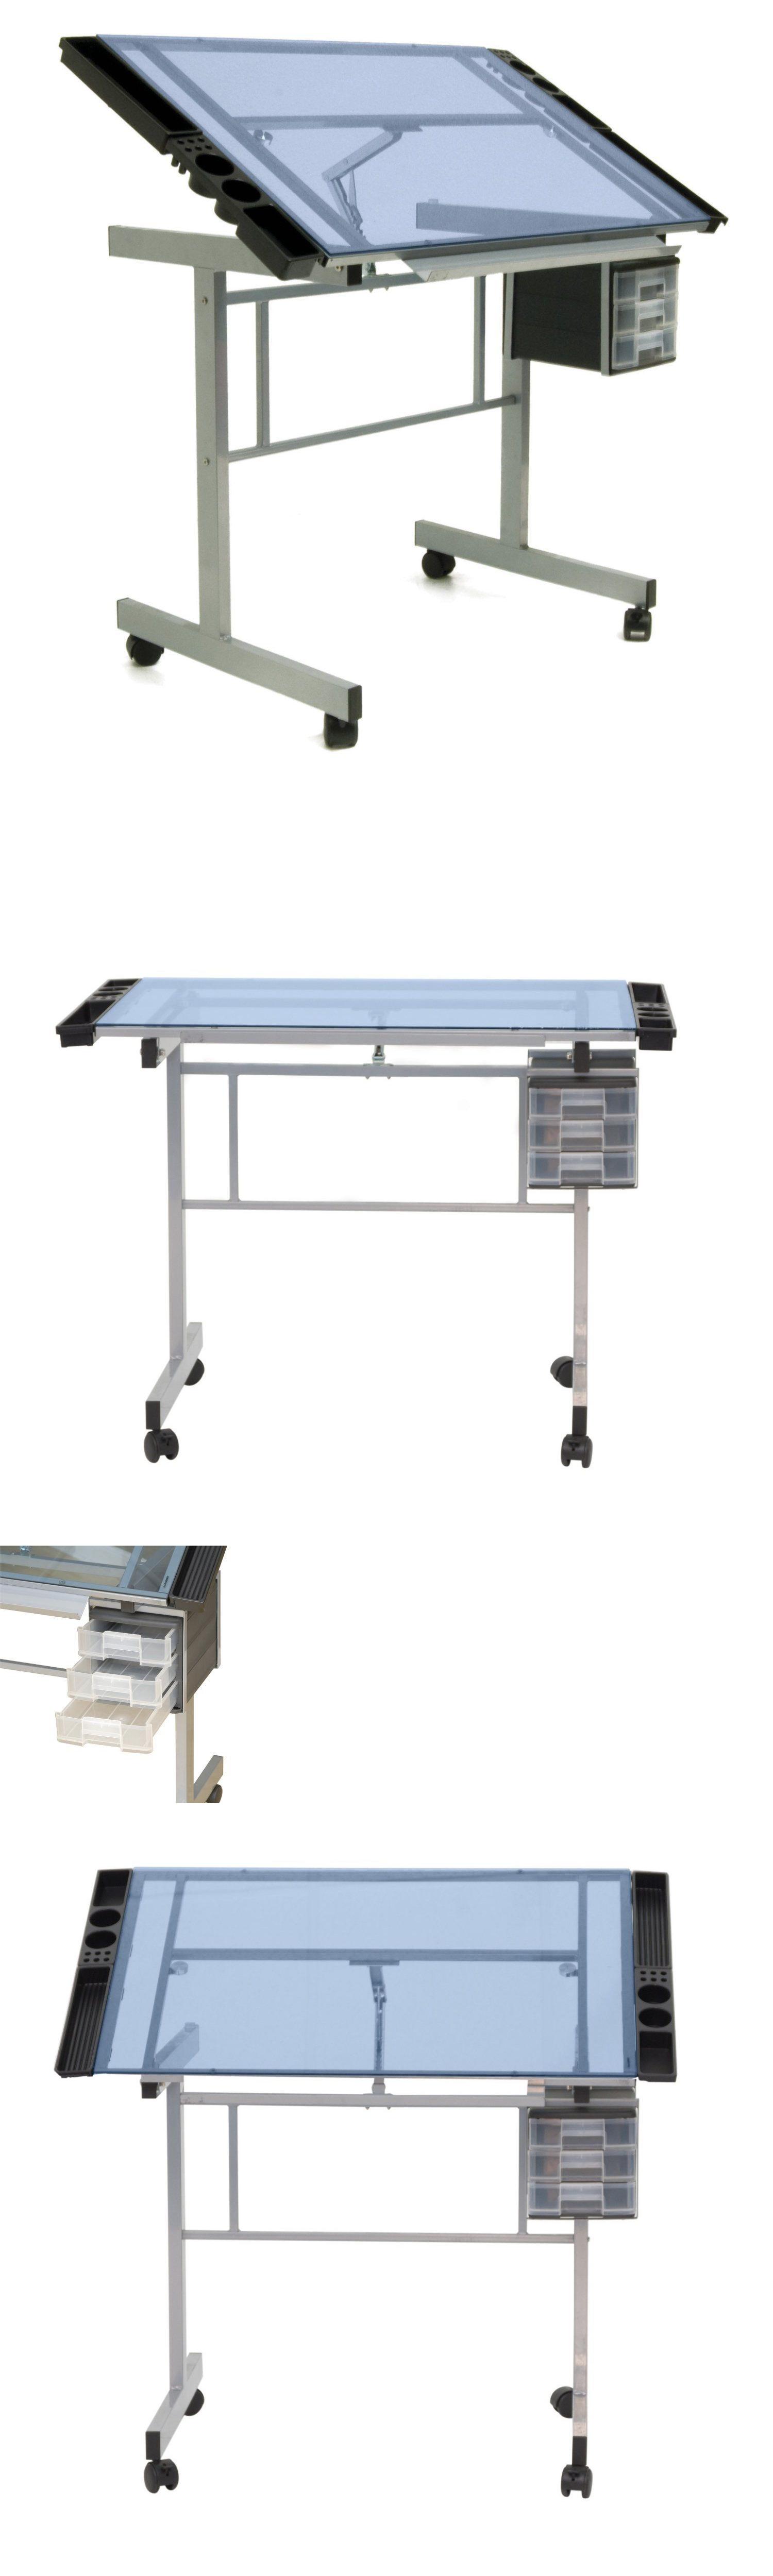 Stationery 183088: Drafting Art Designs Studio Home Office Furniture Vision Craft  Station Drafting  U003e